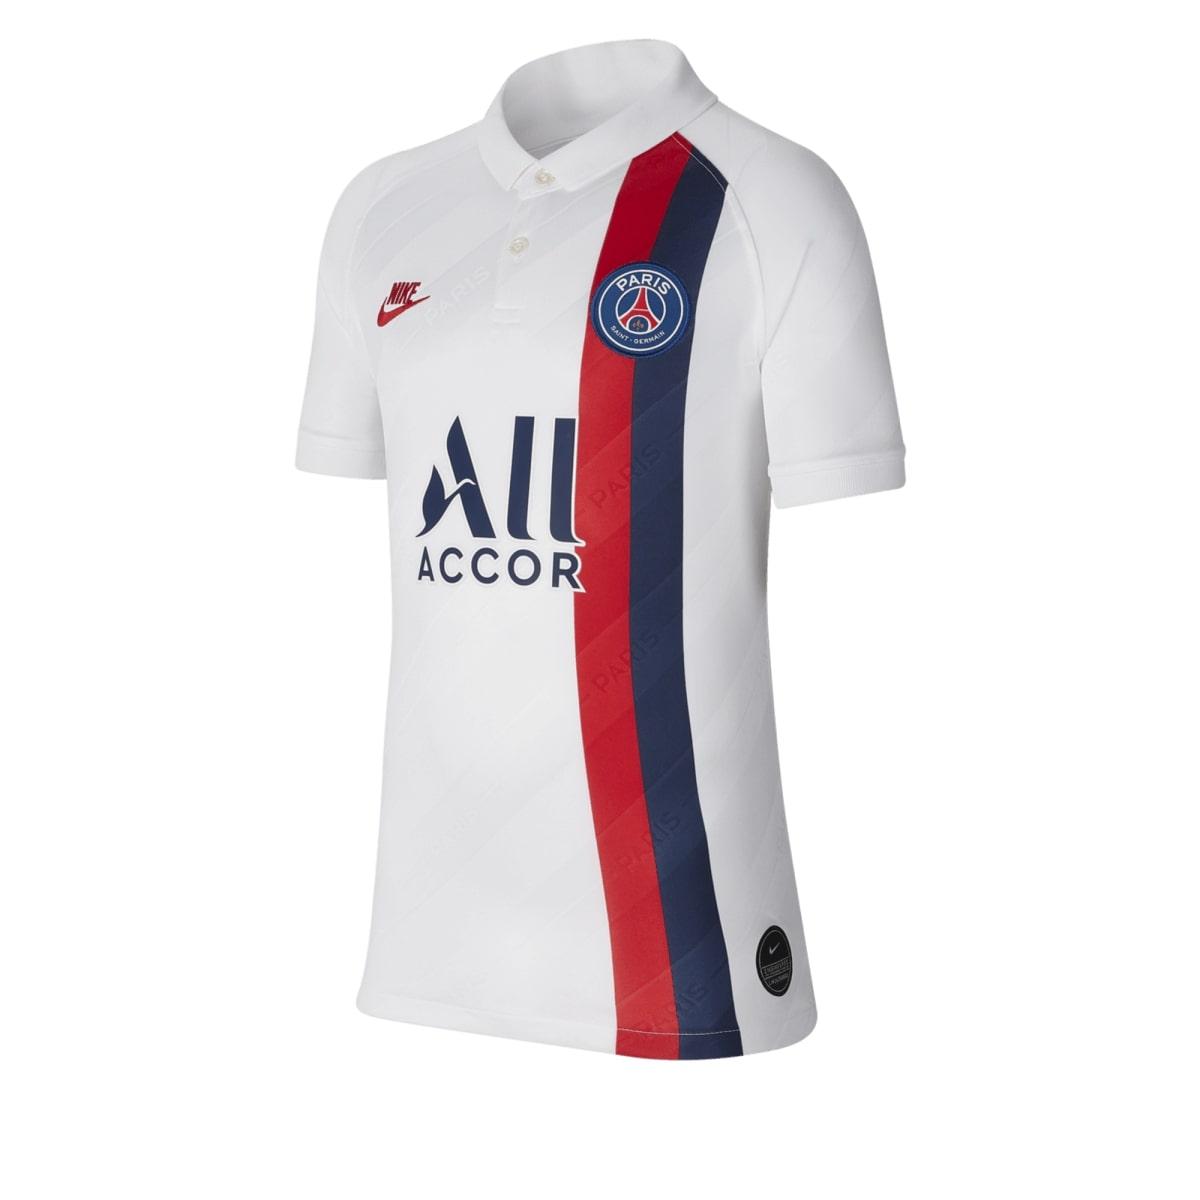 Camisa Nike Paris Saint Germain Stadium Home 3 19/20